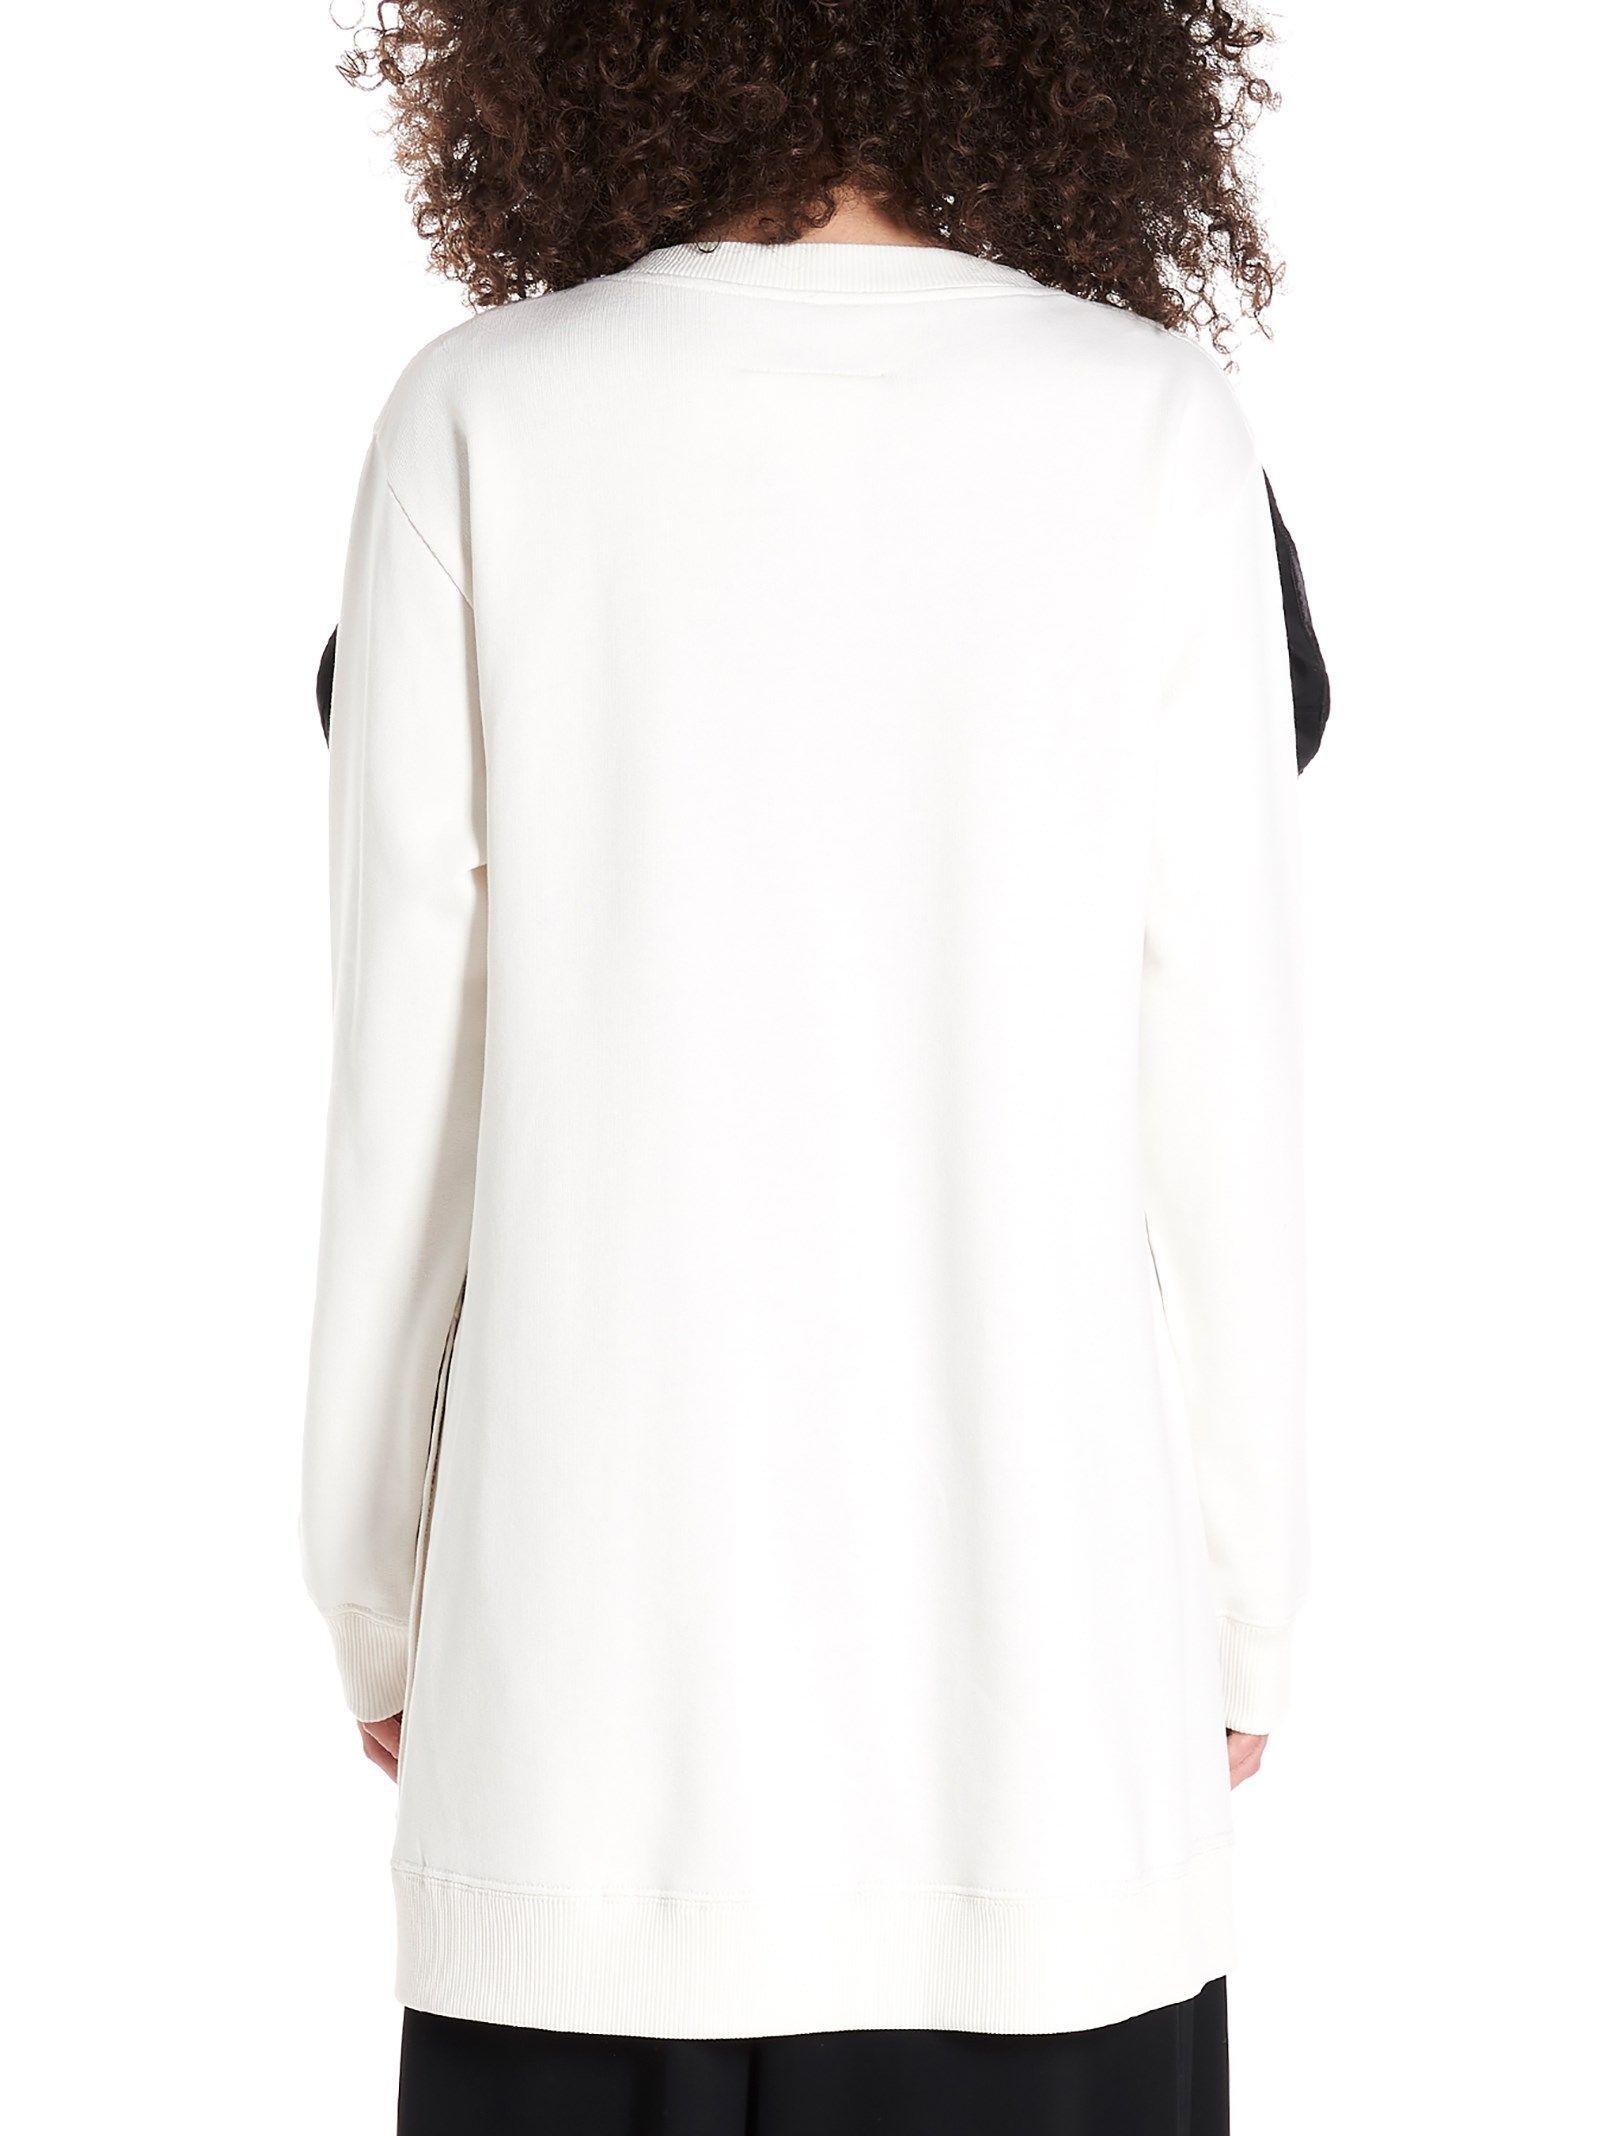 MAISON MARGIELA WOMEN'S S52GU0082S25328101 WHITE COTTON SWEATSHIRT